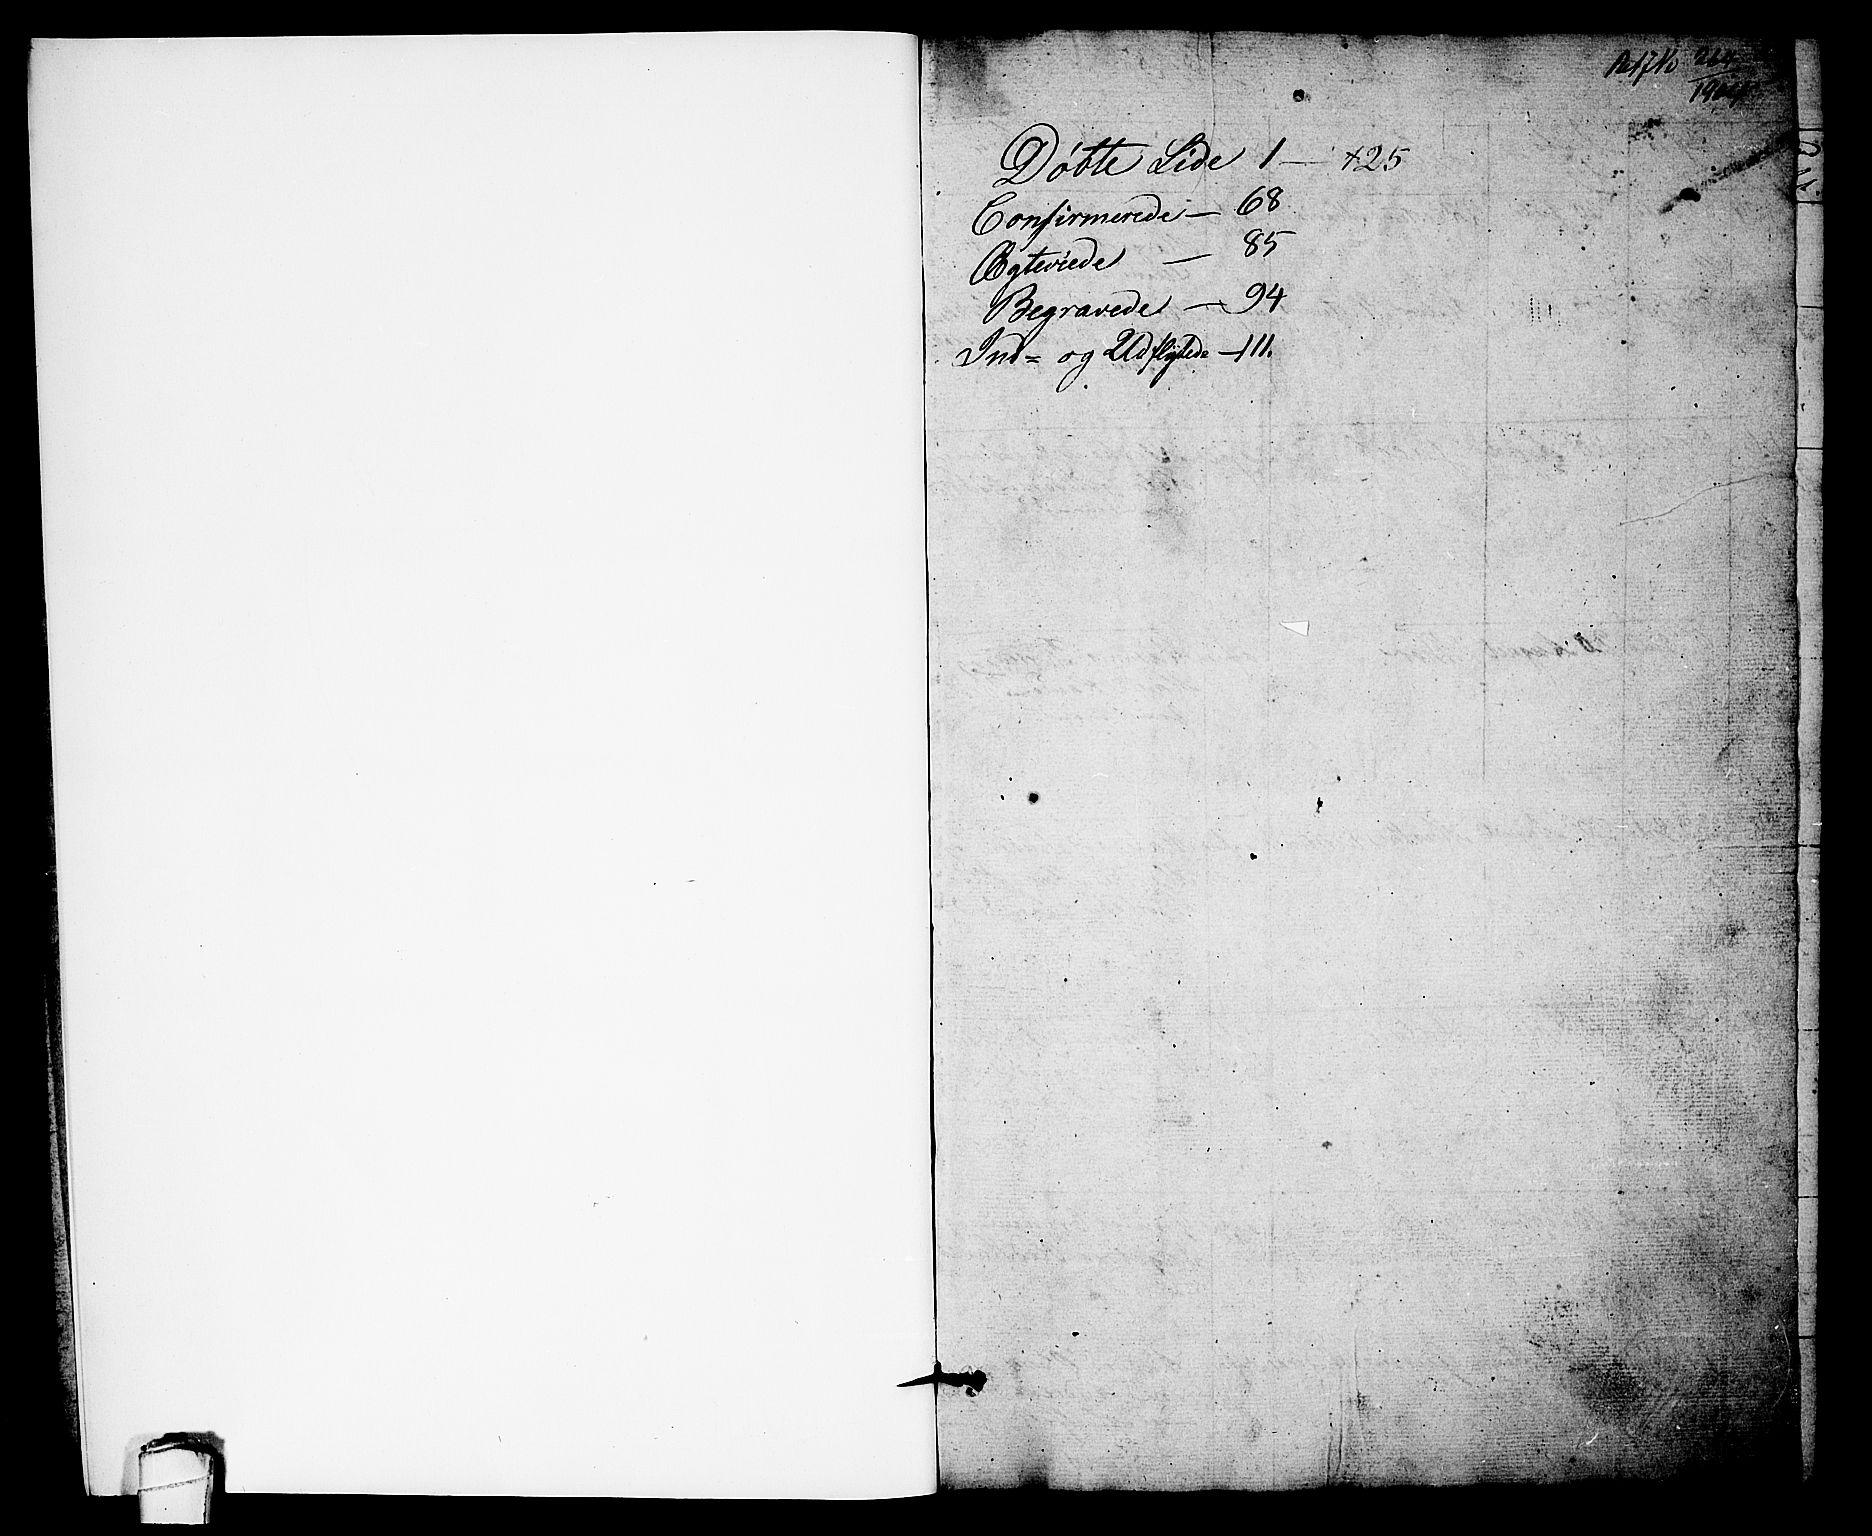 SAKO, Solum kirkebøker, G/Gb/L0001: Klokkerbok nr. II 1, 1848-1859